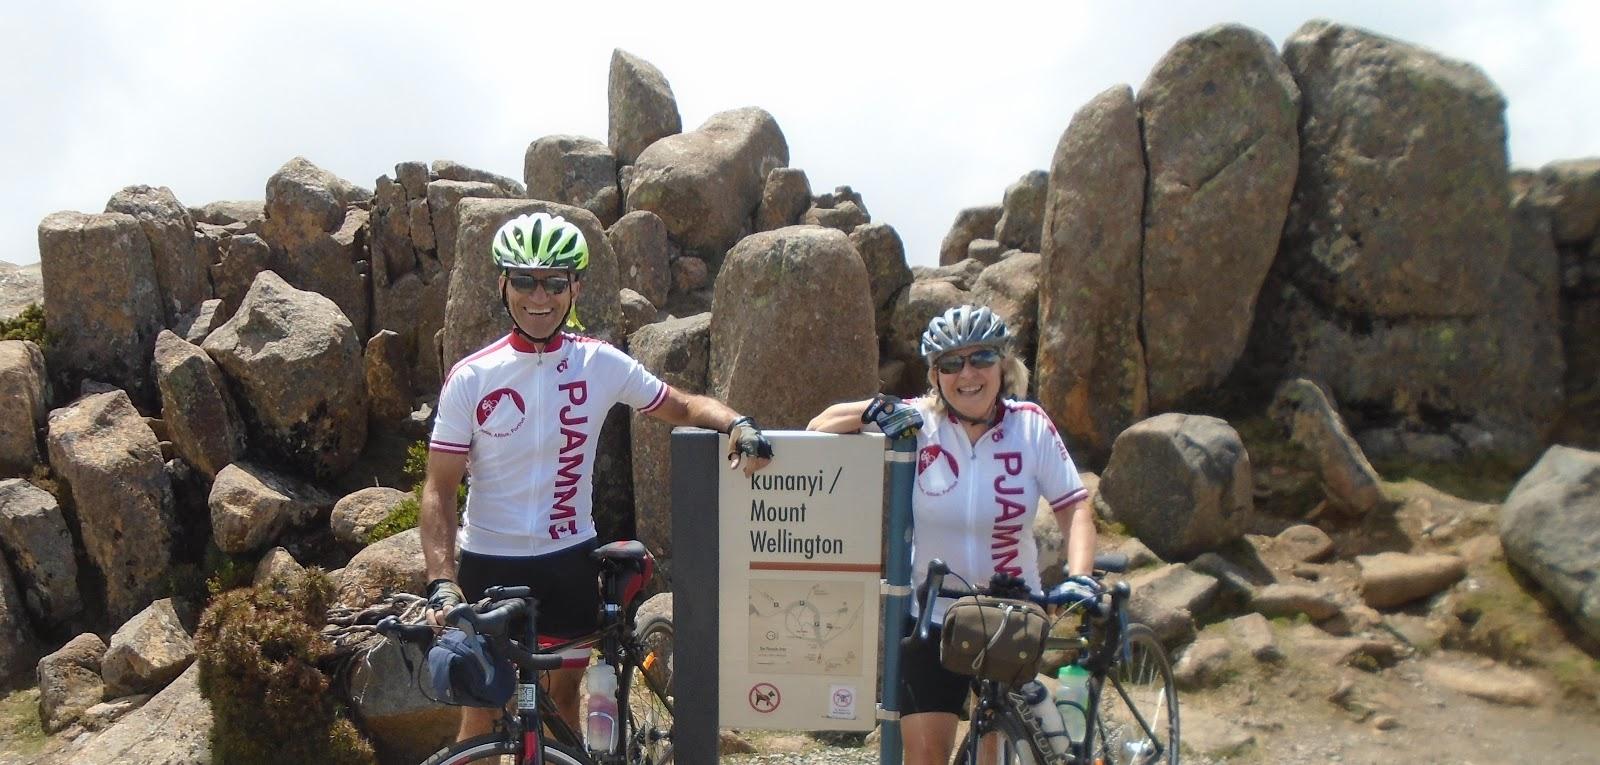 Cycling Mt. Wellington -  Lynn Sugden and Lynn Rousseau (Edmonton, Alberta, CAN) , summit sign